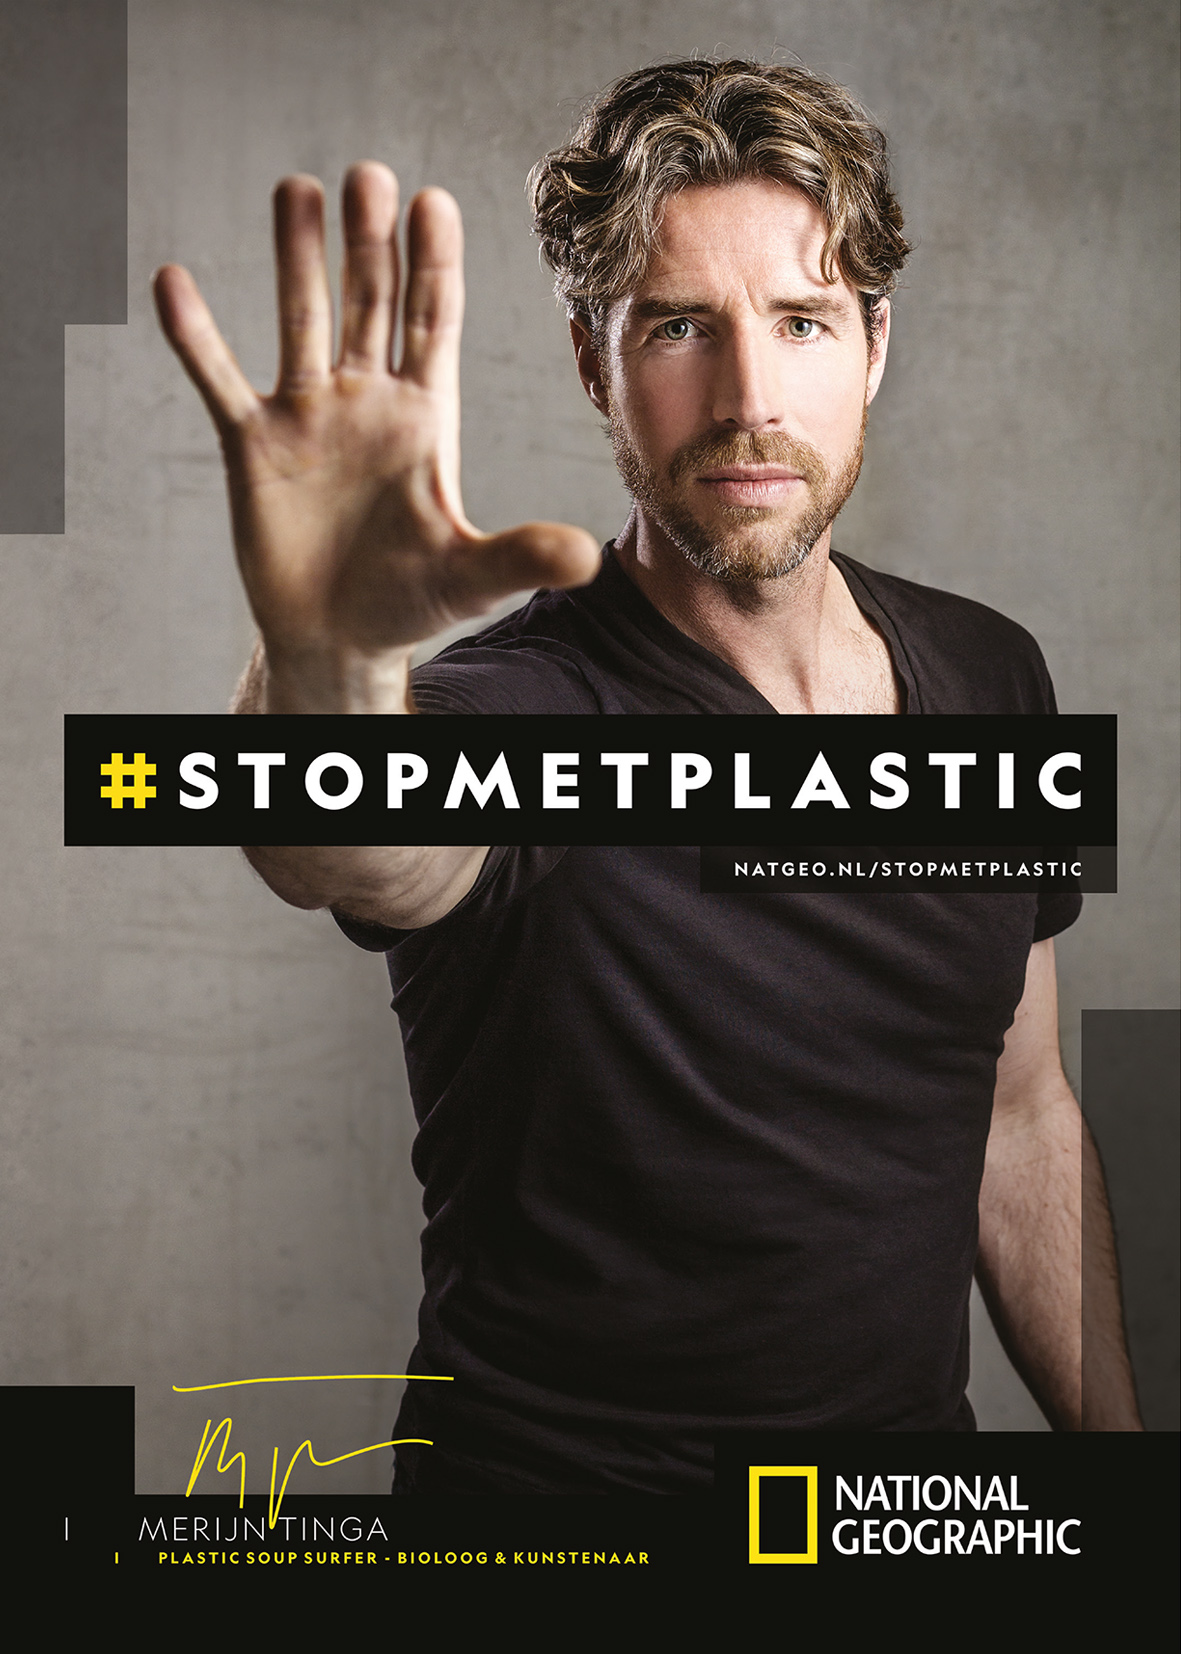 National Geographic: Campagne #STOPMETPLASTIC